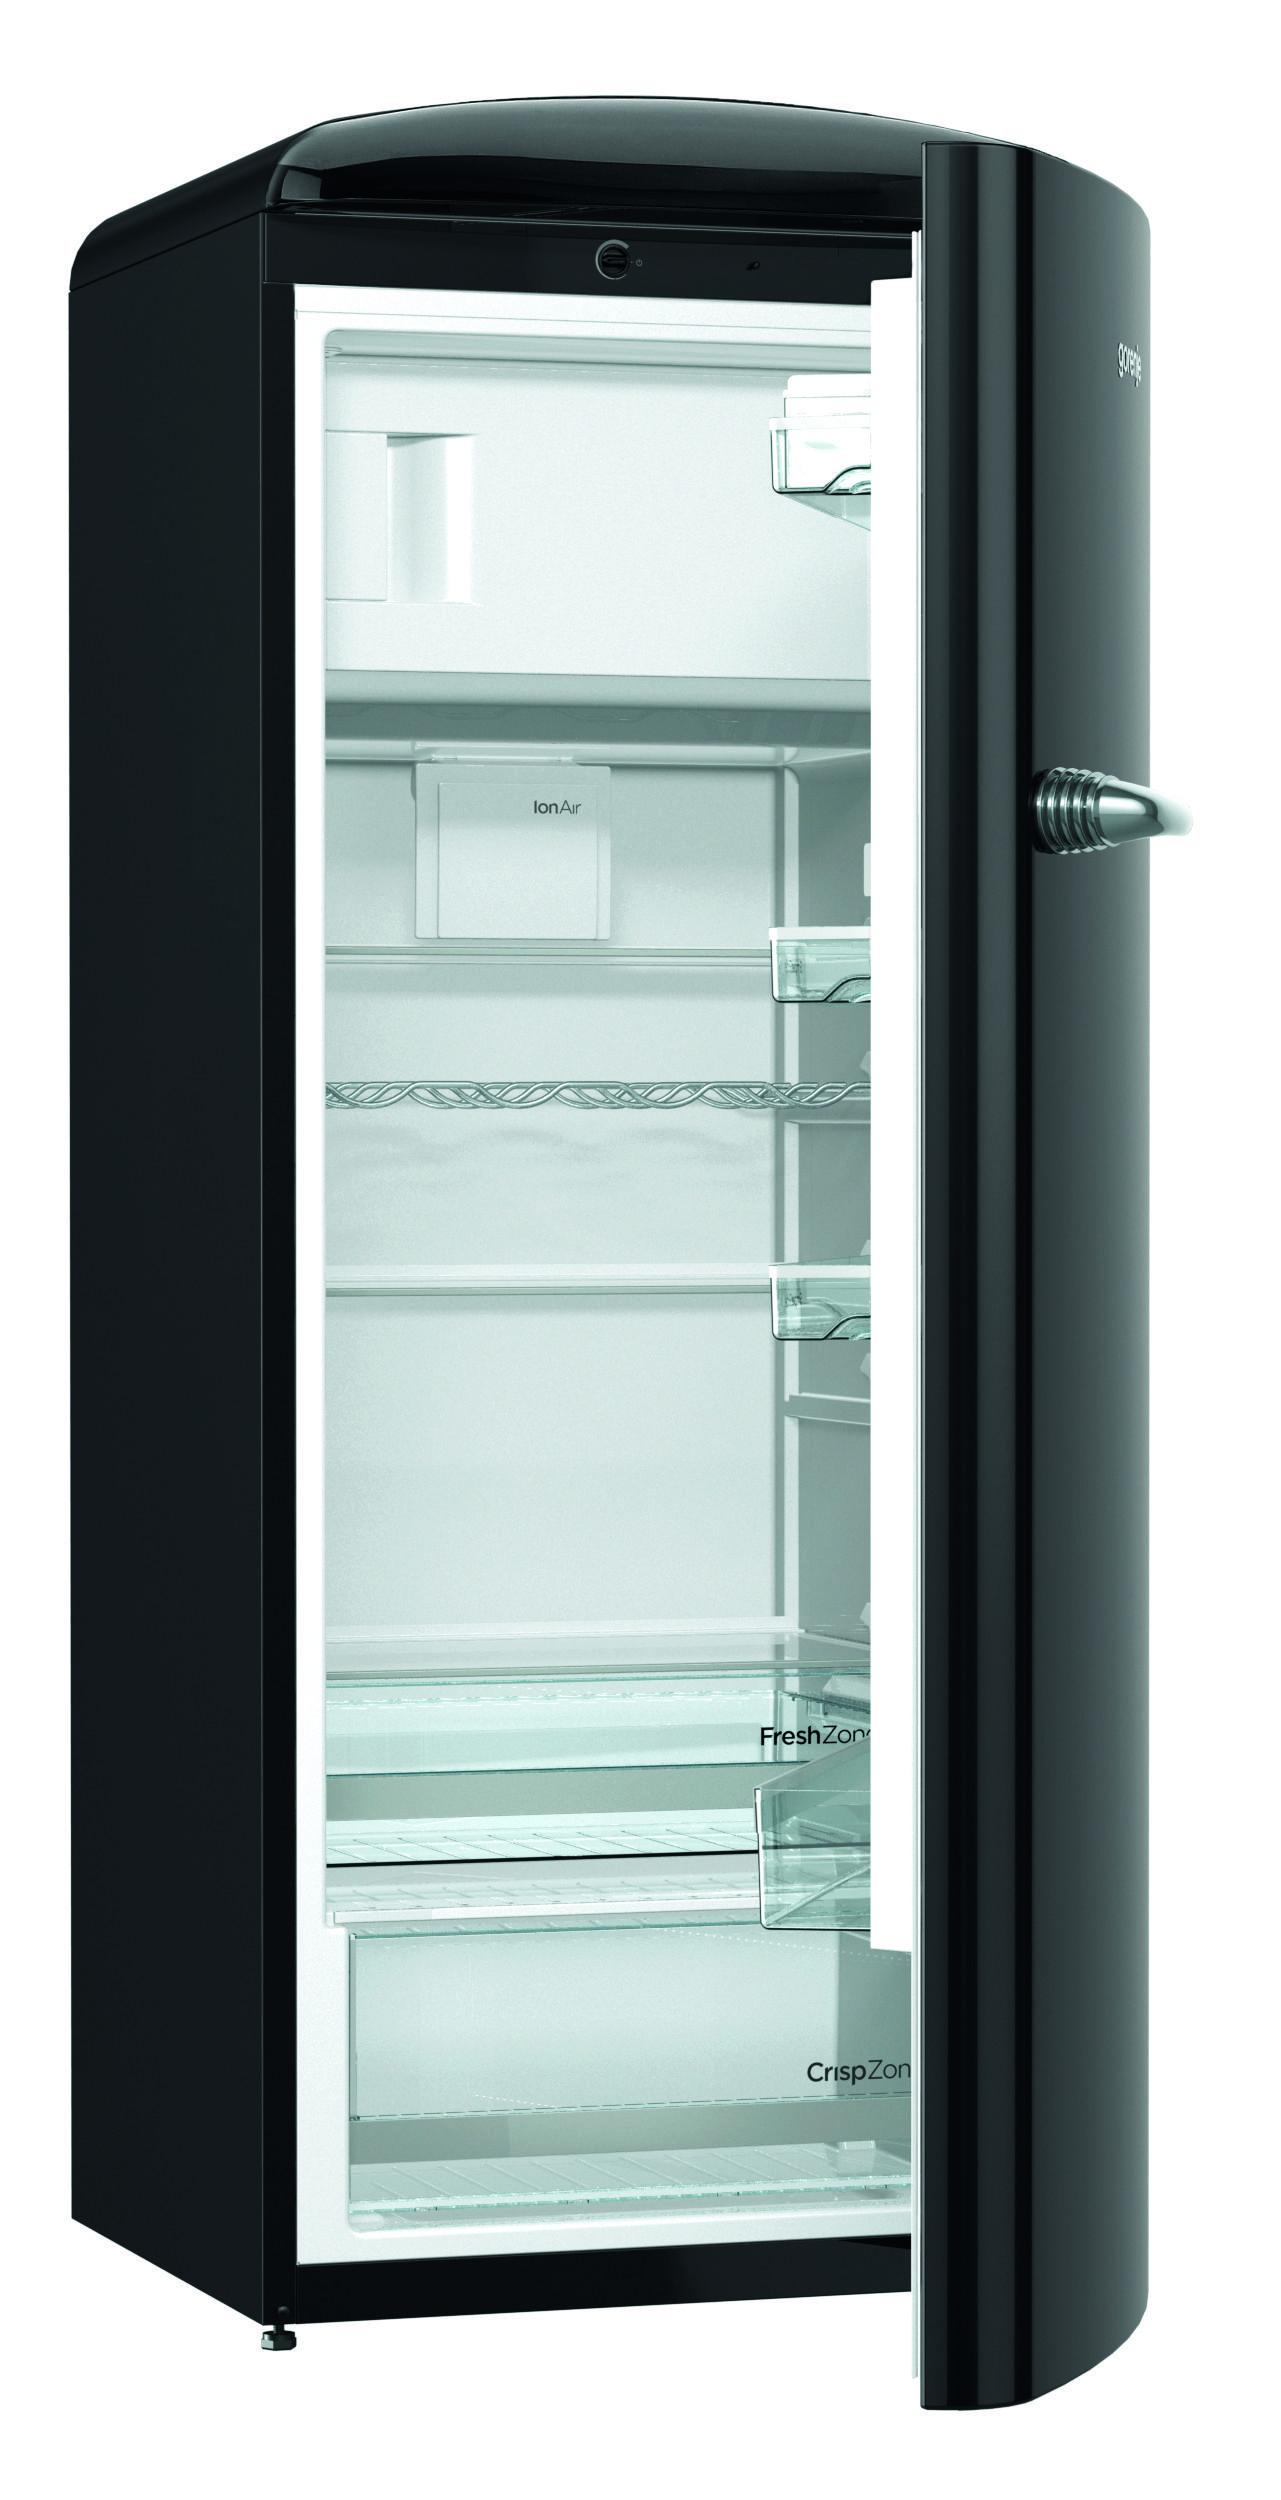 Gorenje Retro ORB153BK Refrigerator Black cut out open door